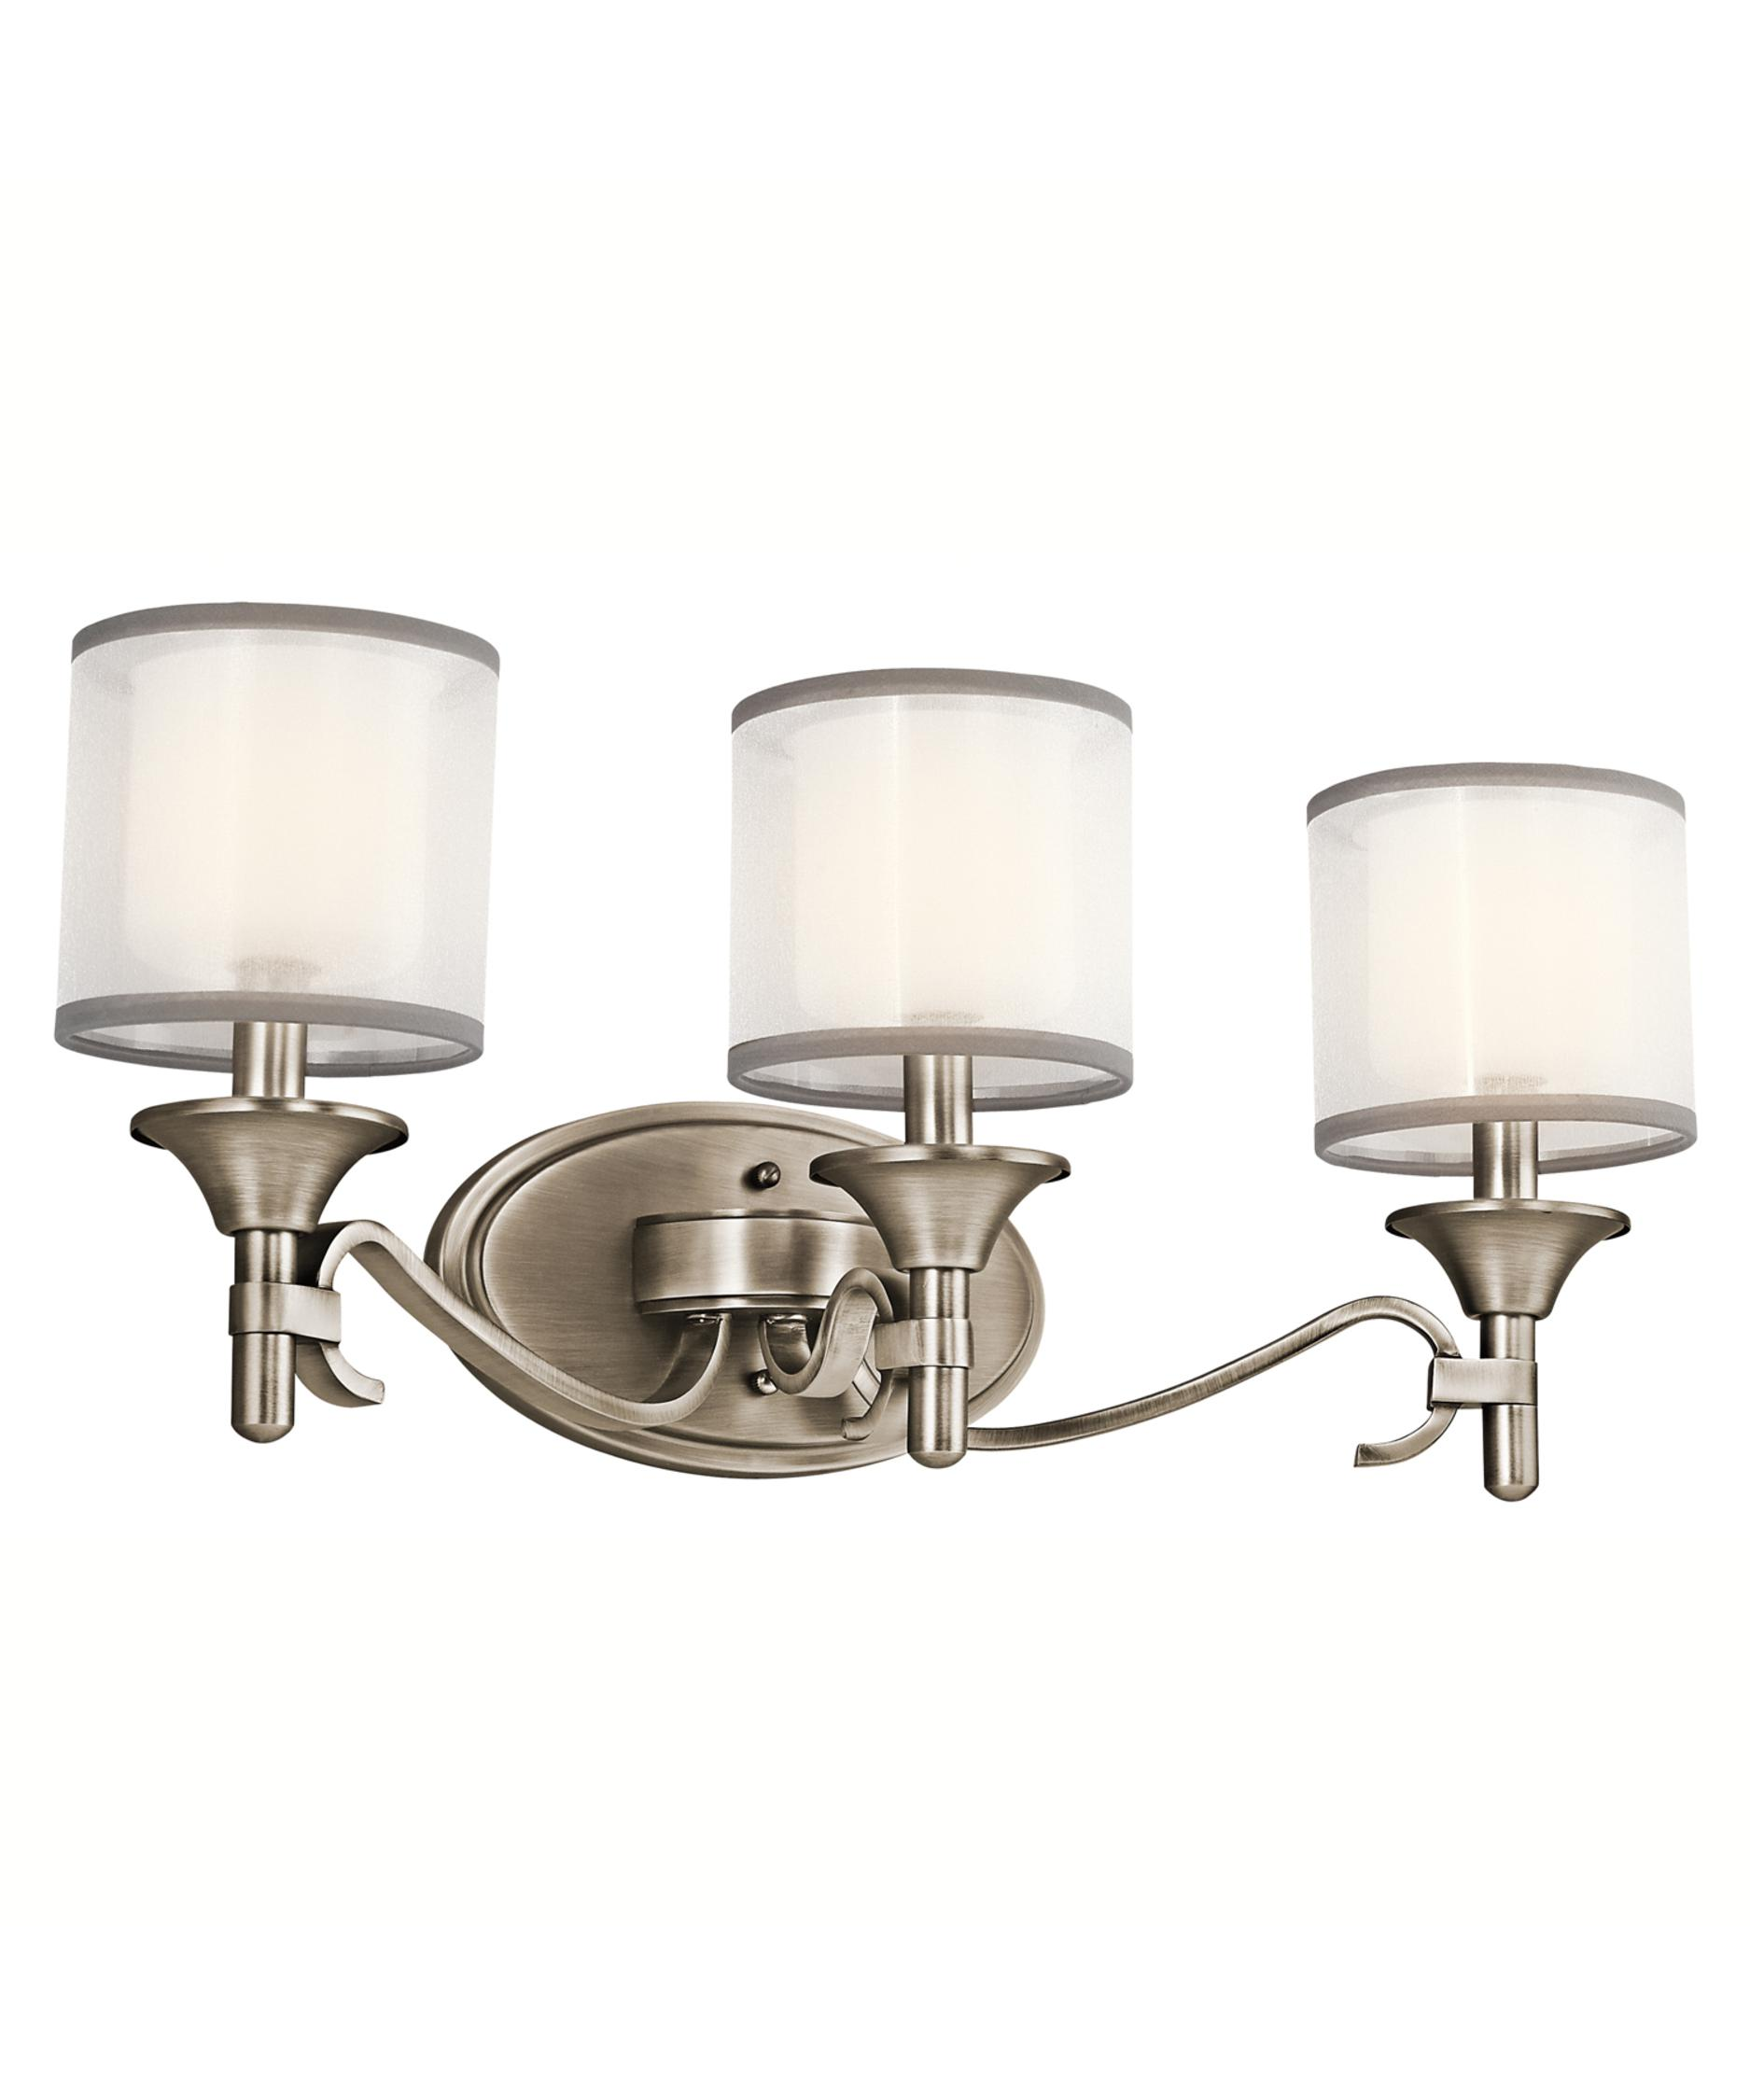 kichler lacey 22 inch wide bath vanity light capitol lighting - Bathroom Vanity Light Height